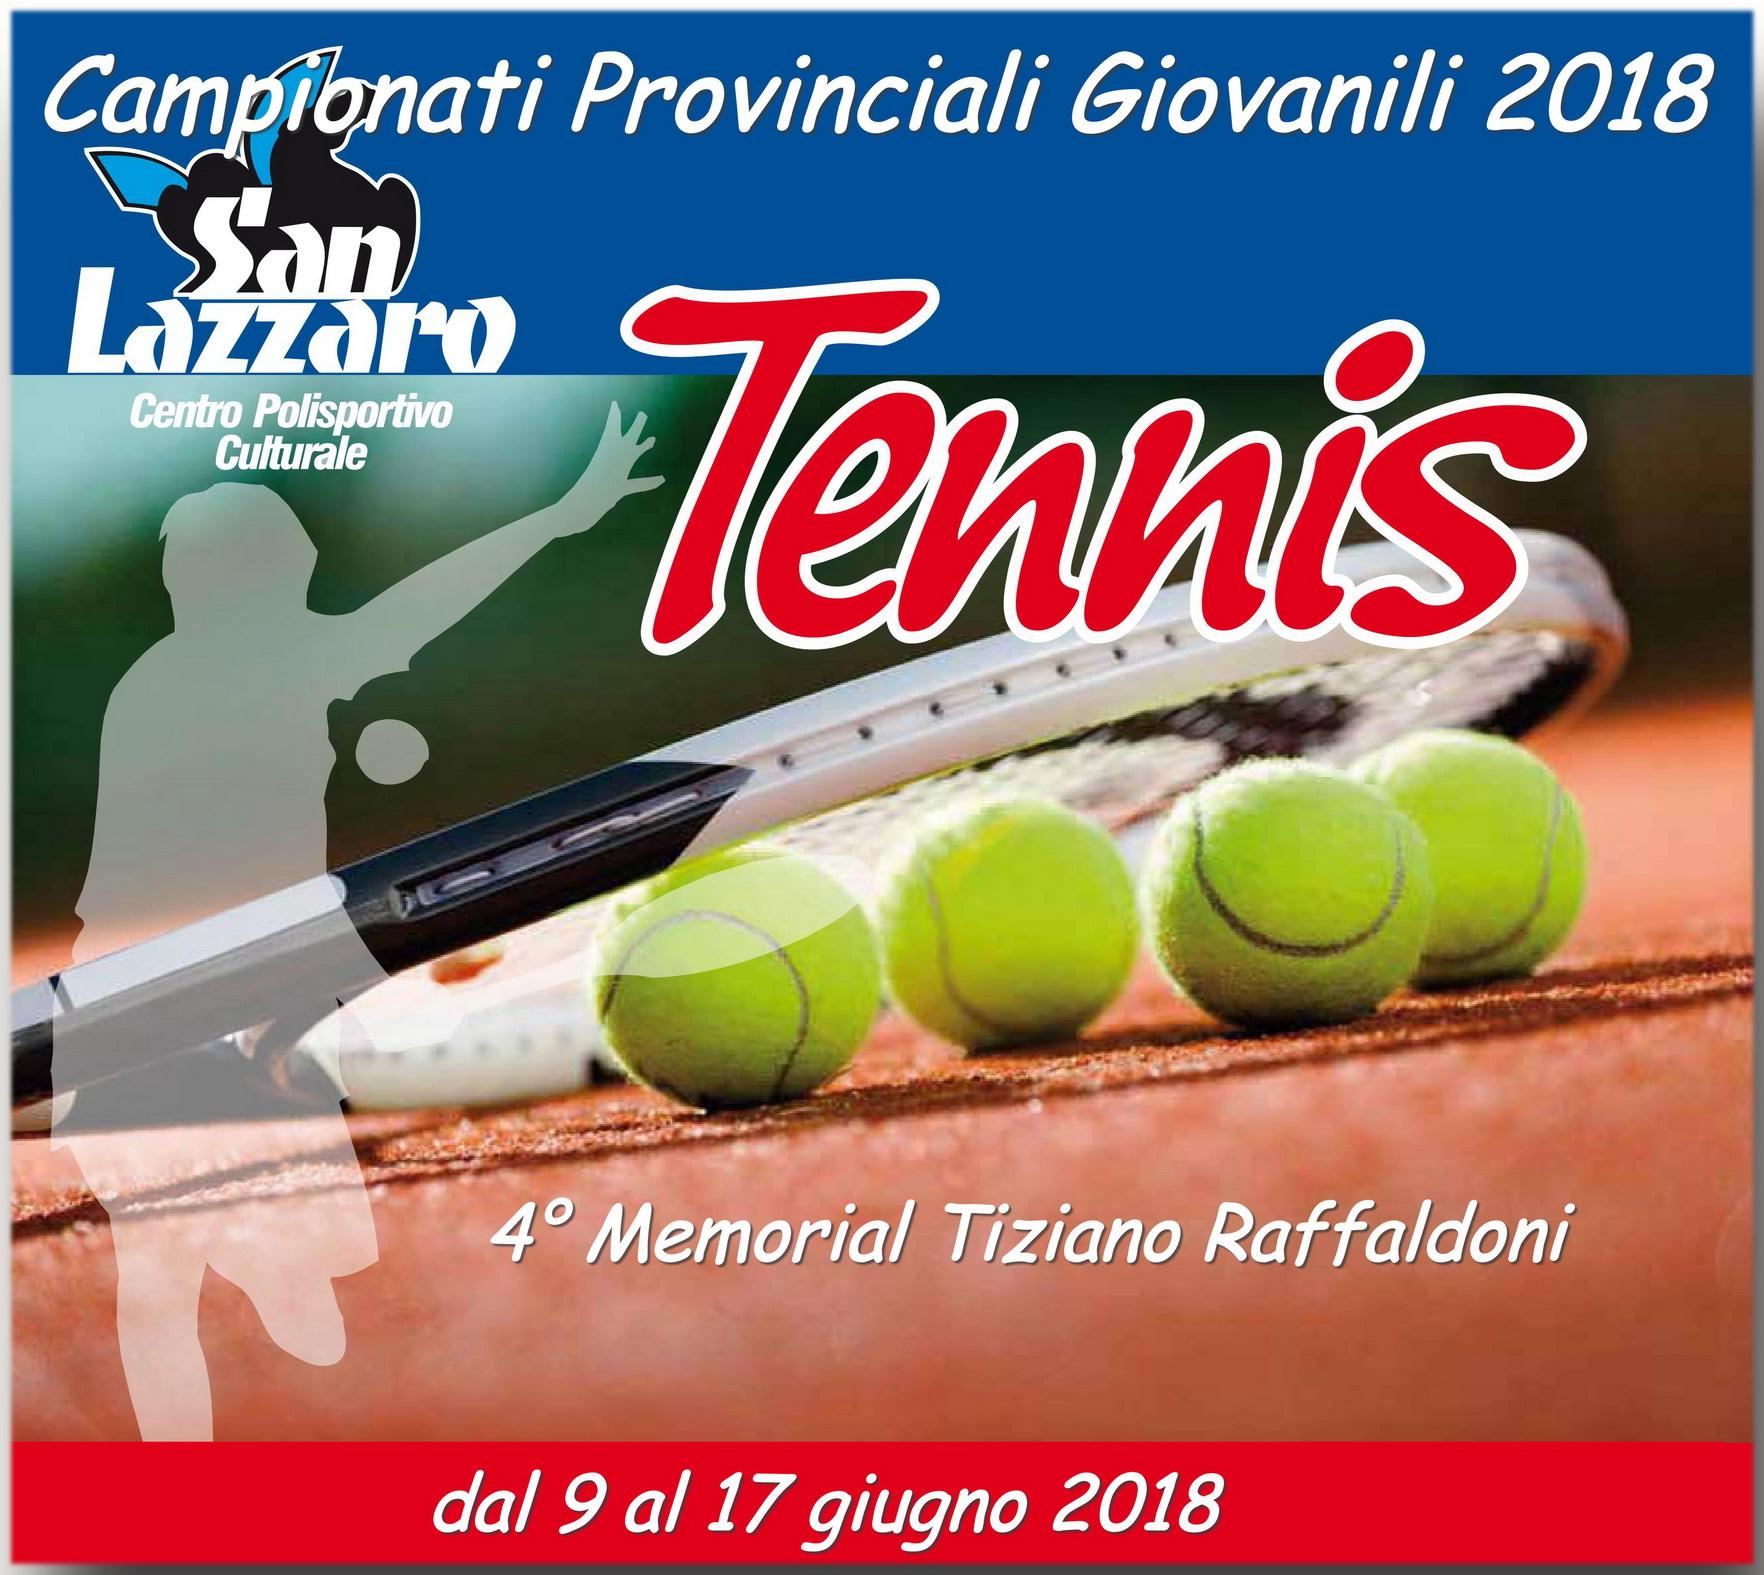 Tennis – Campionati Provinciali Giovanili 2018 MANTOVA